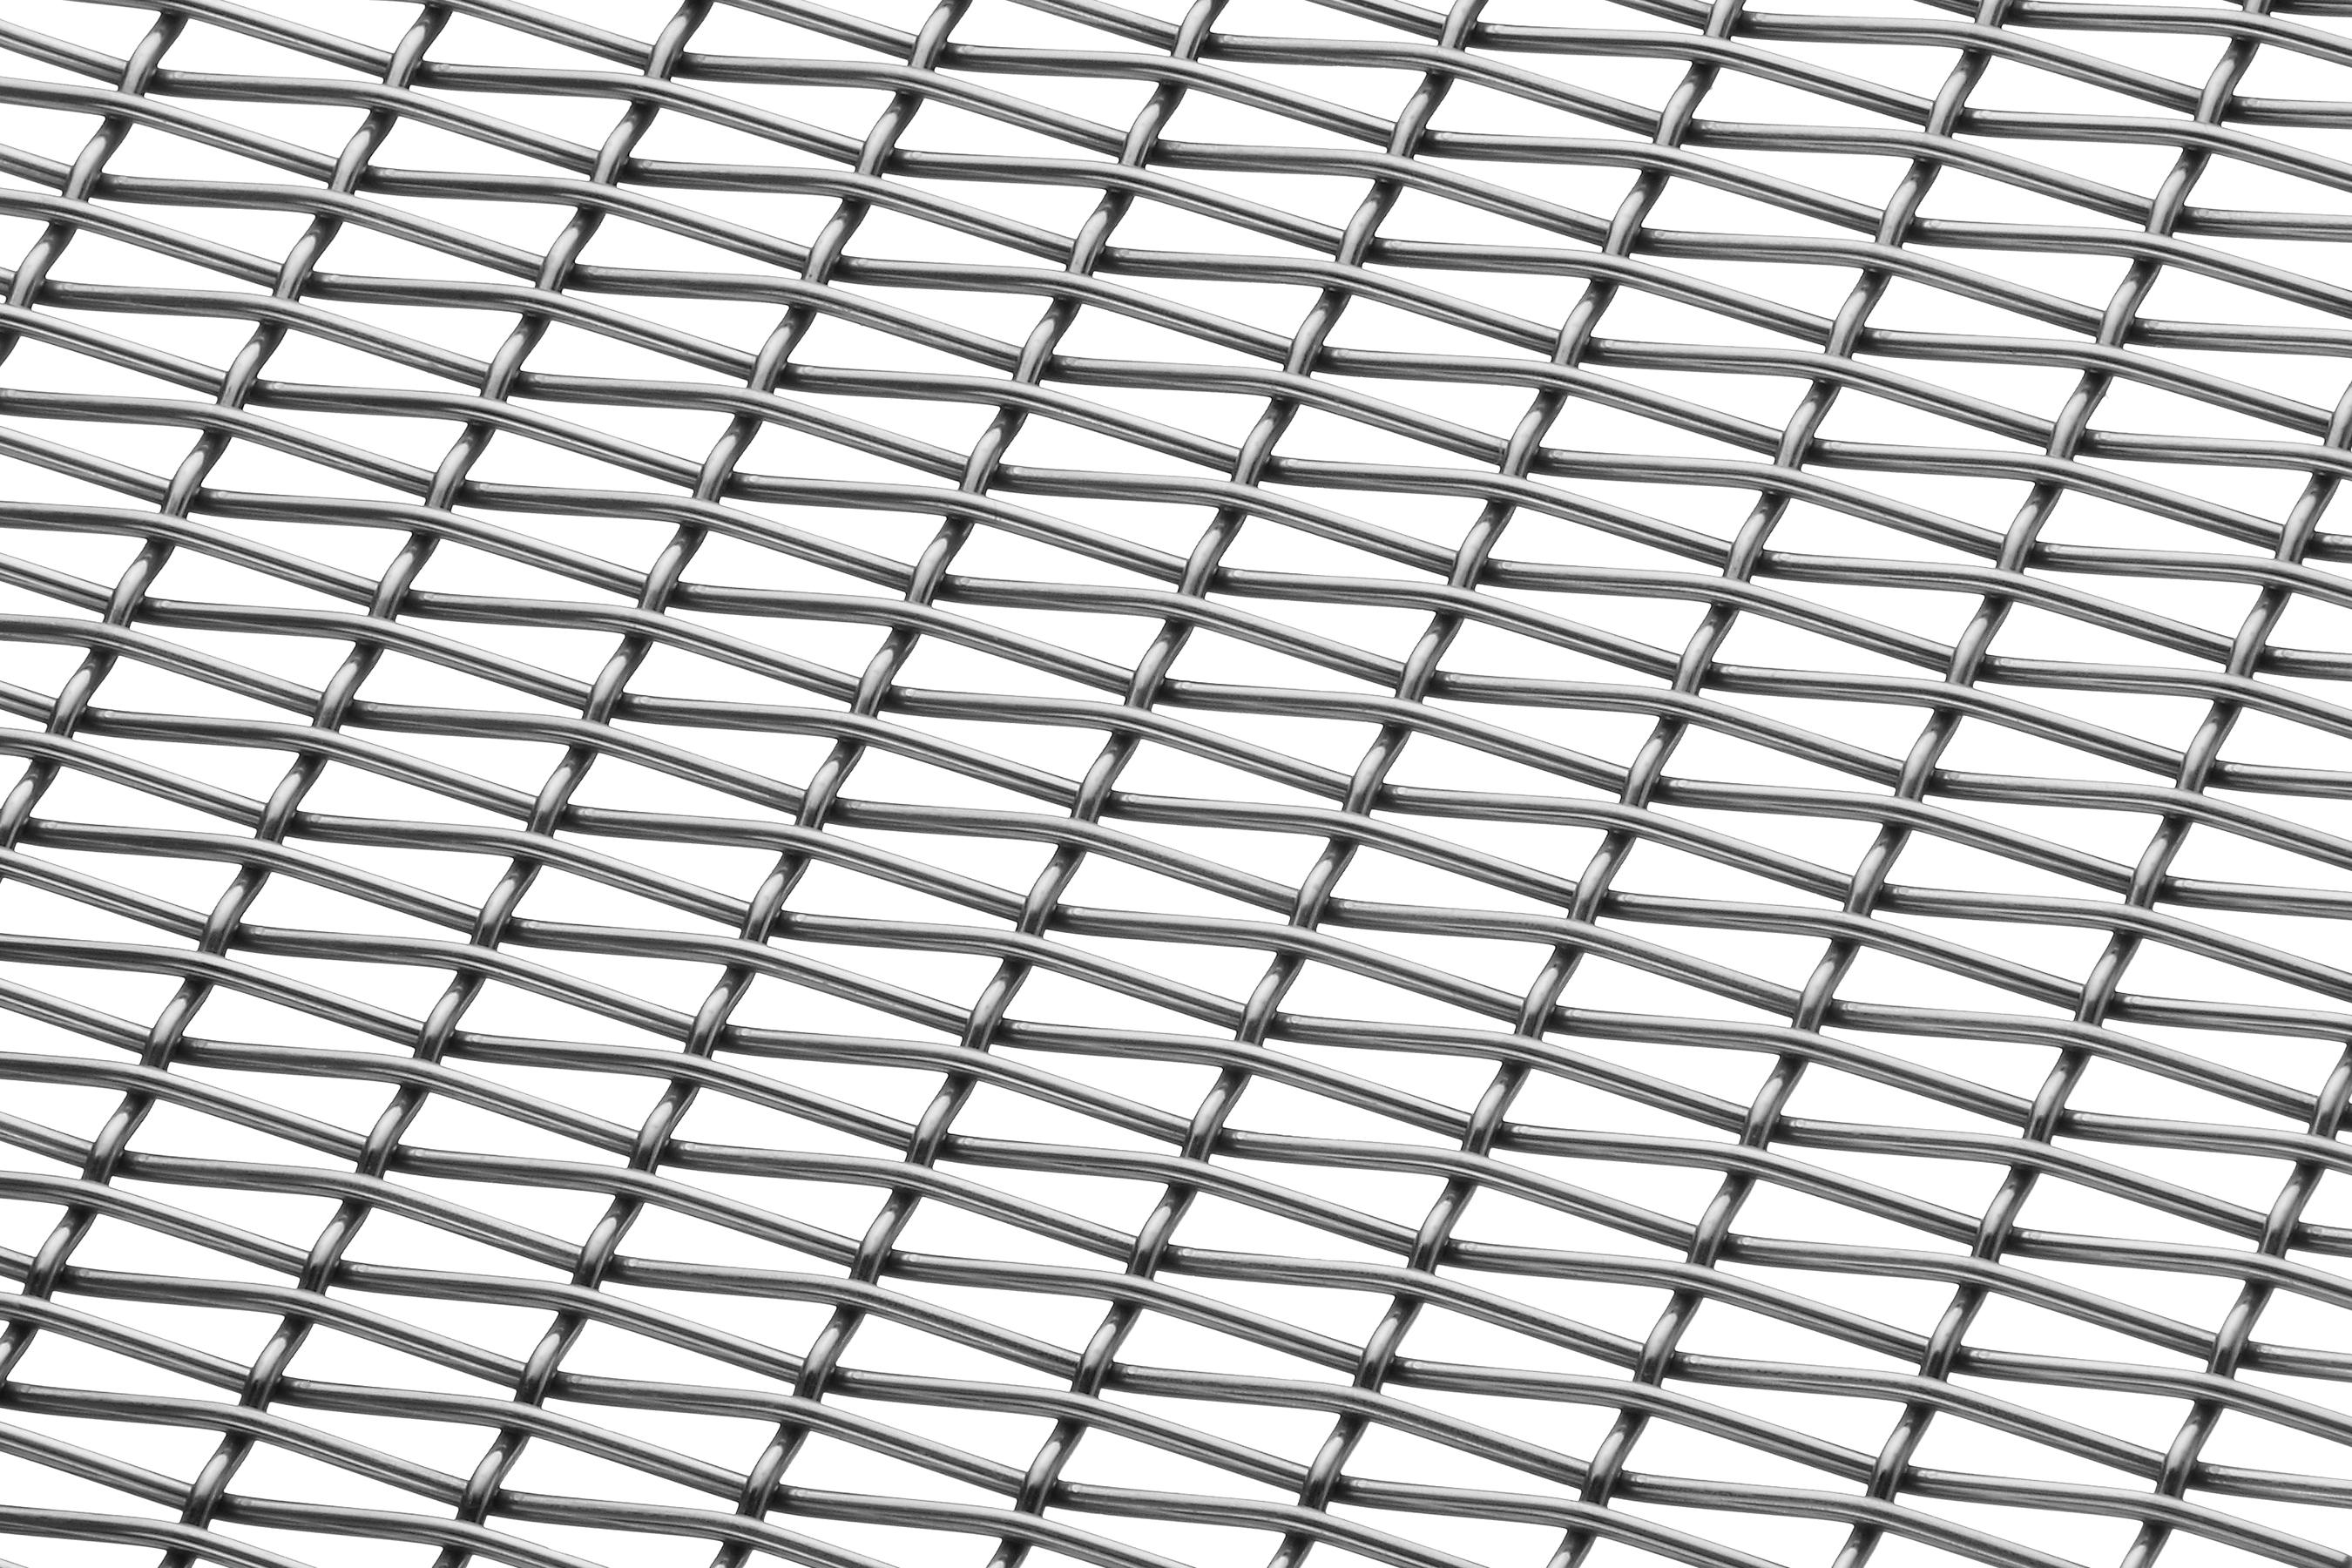 PZ-12 Architectural wire mesh pattern